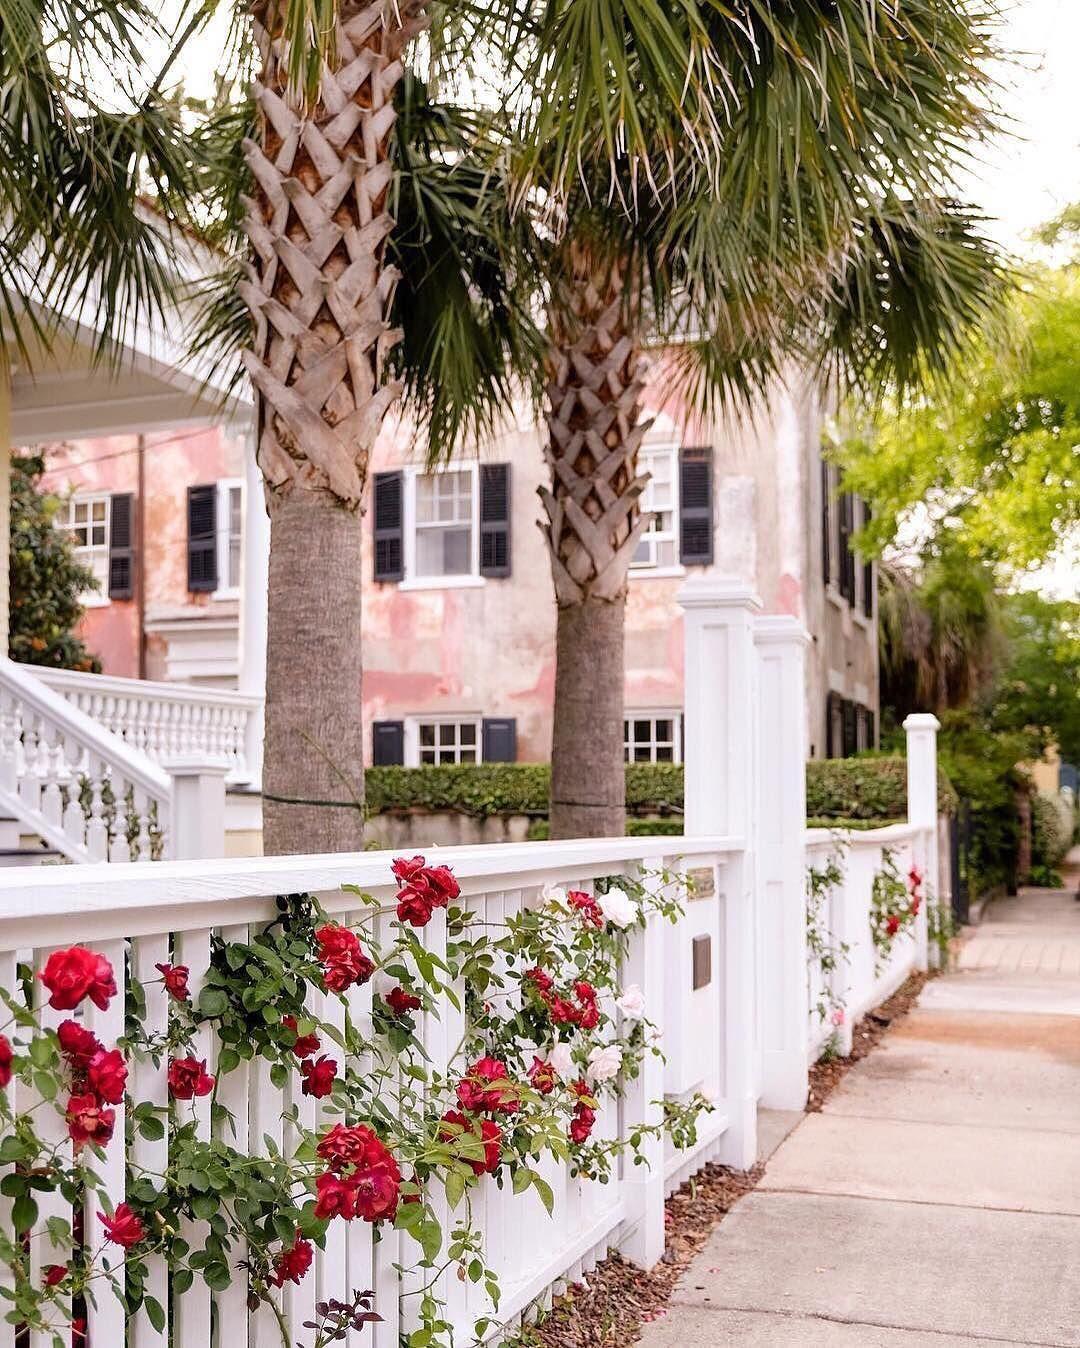 Instagram Photo By Charleston Sc Official Account May 20 2016 At 10 36am Utc South Carolina Homes Explore Charleston Charleston